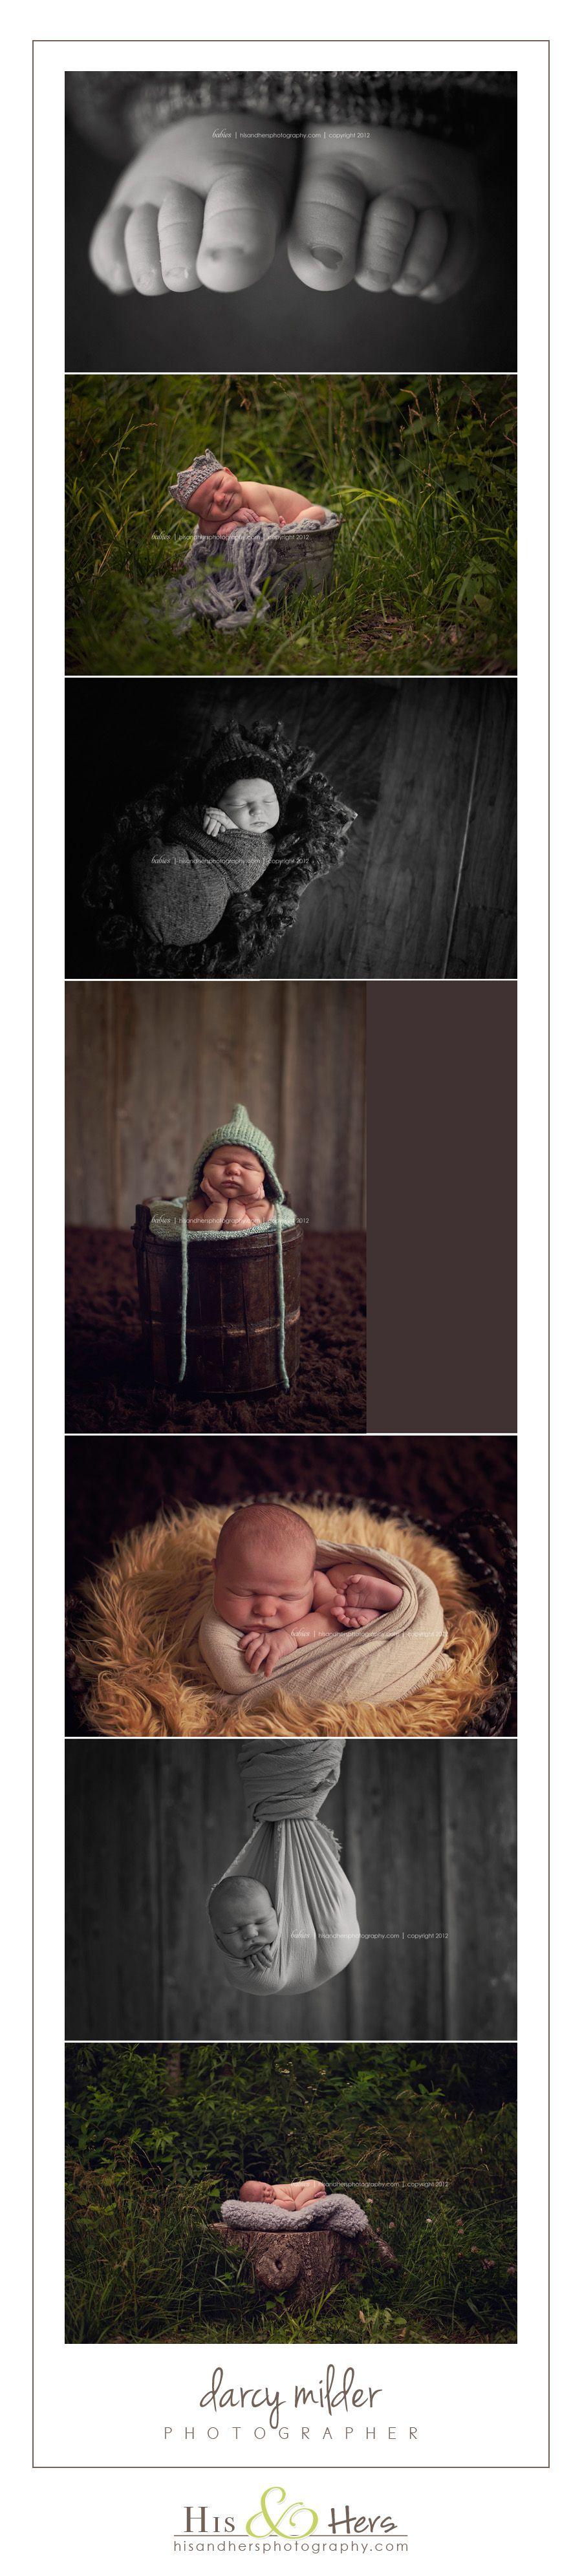 newborn photographer des moines iowa, baby infant portraits pictures, Darcy Milder His & Hers